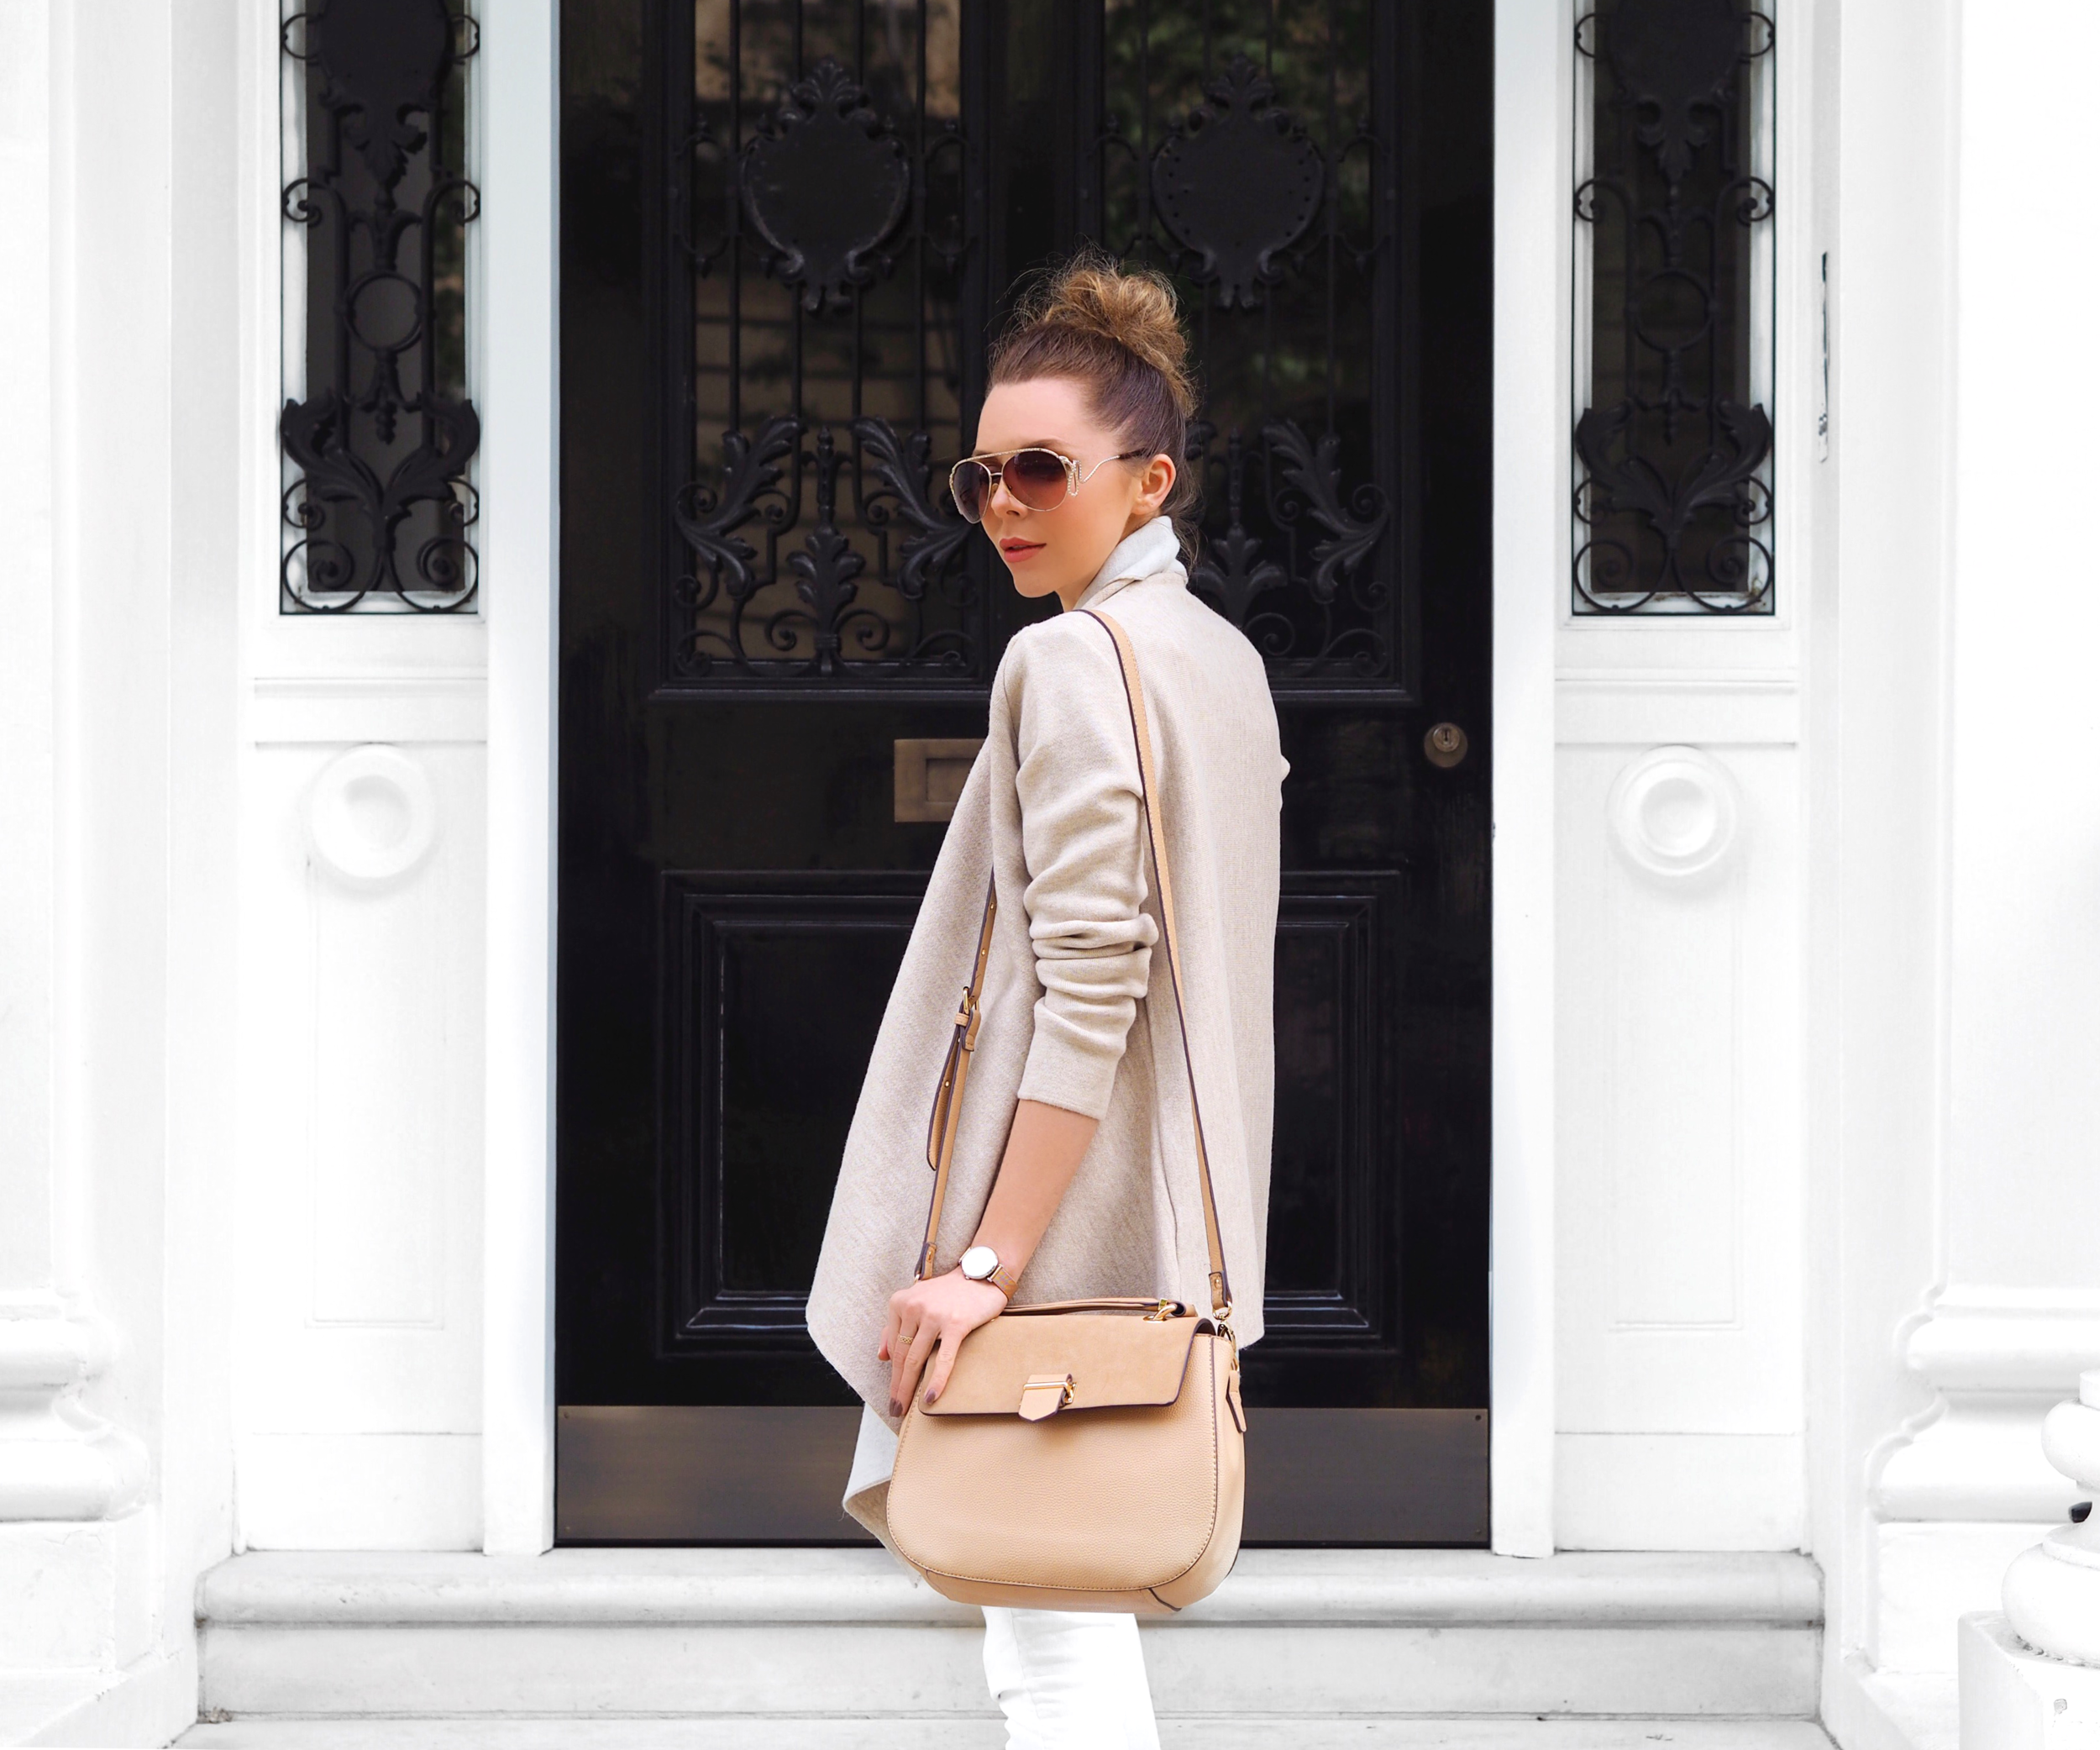 SUMMER STYLE WEARING WHITE OOTD LAURA BLAIR STREET STYLE LONDON FASHION GIRL